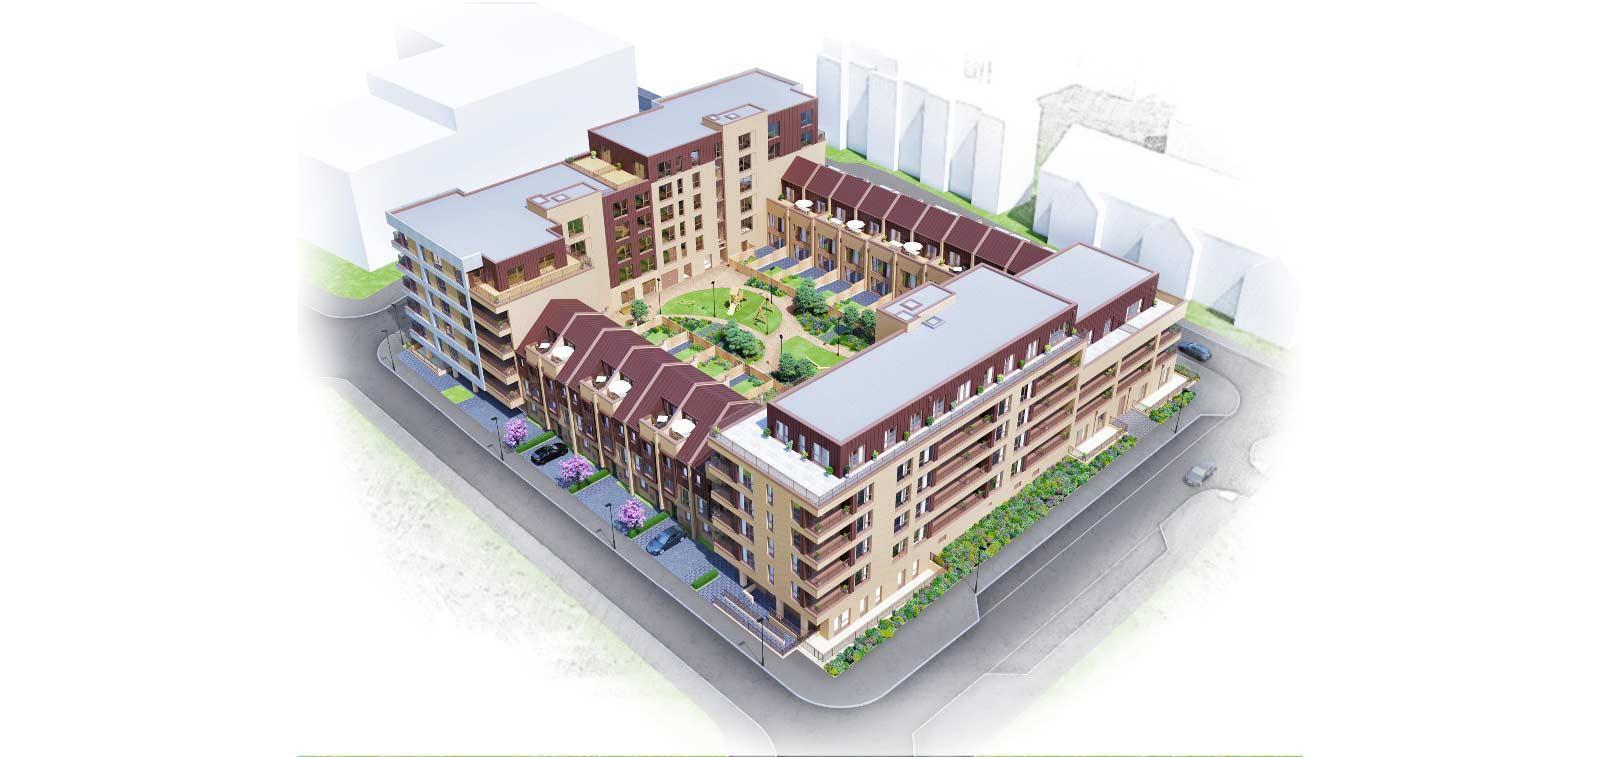 CGI representation of the Millbrook Square development